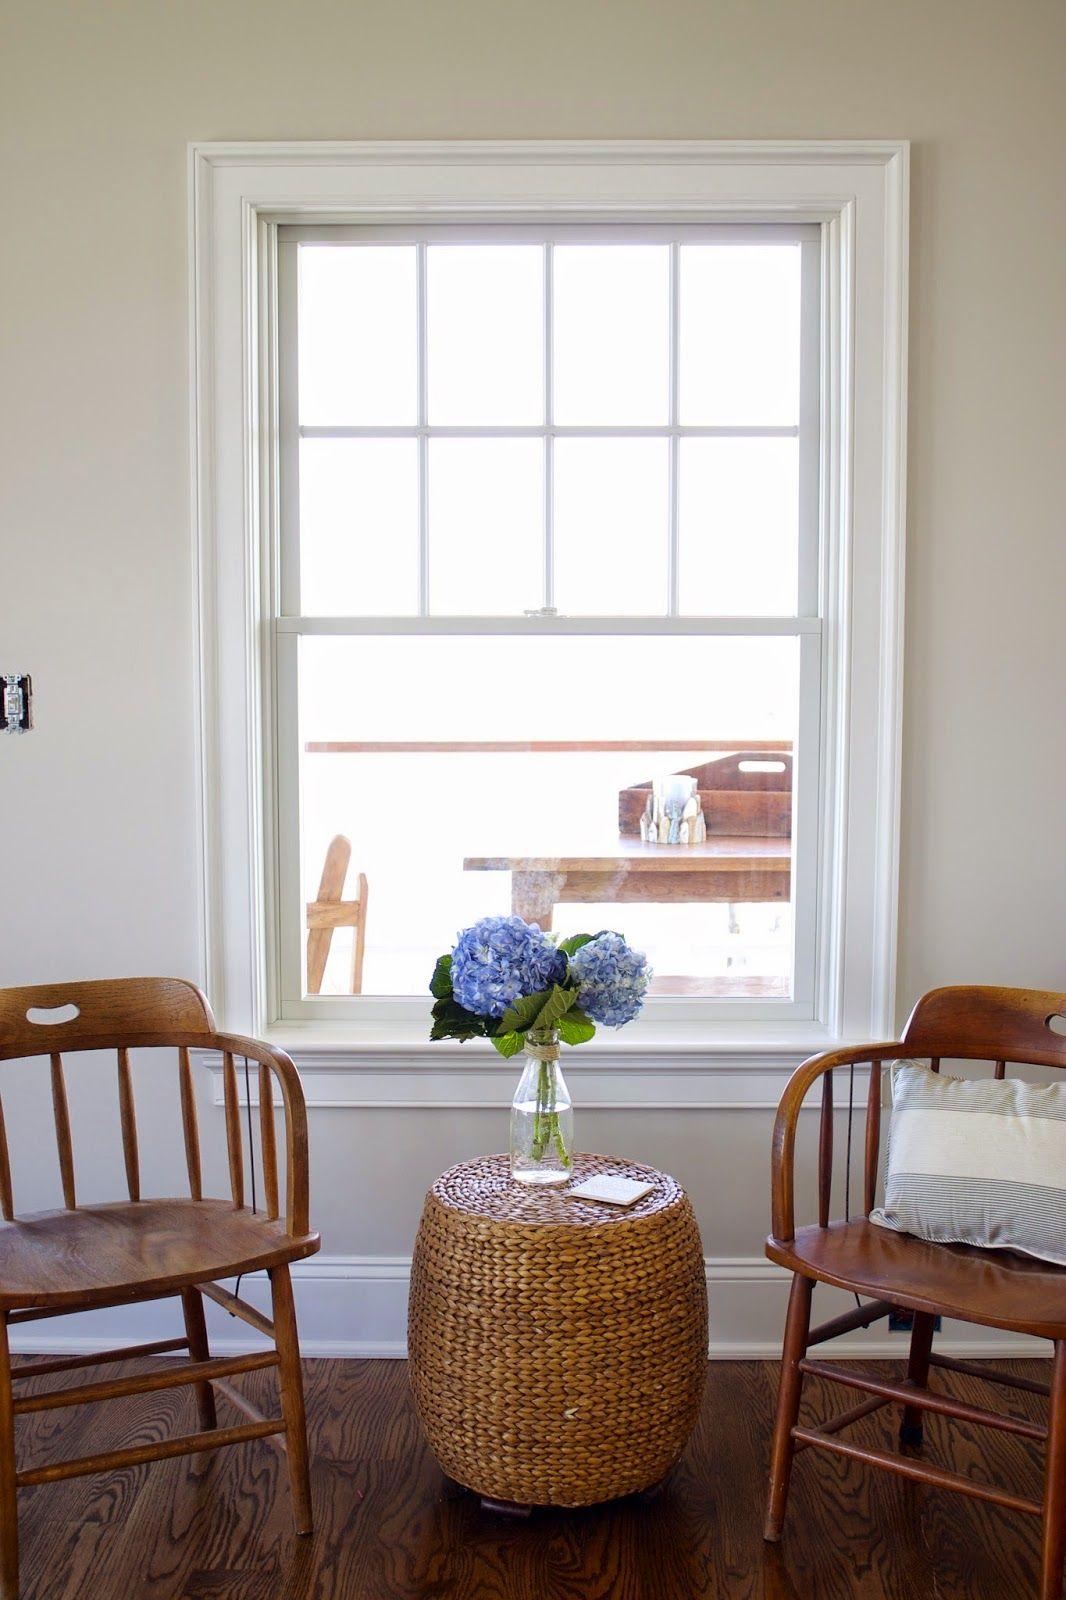 Benjamin Moore Pale Oak walls. Looks great with white trim ...